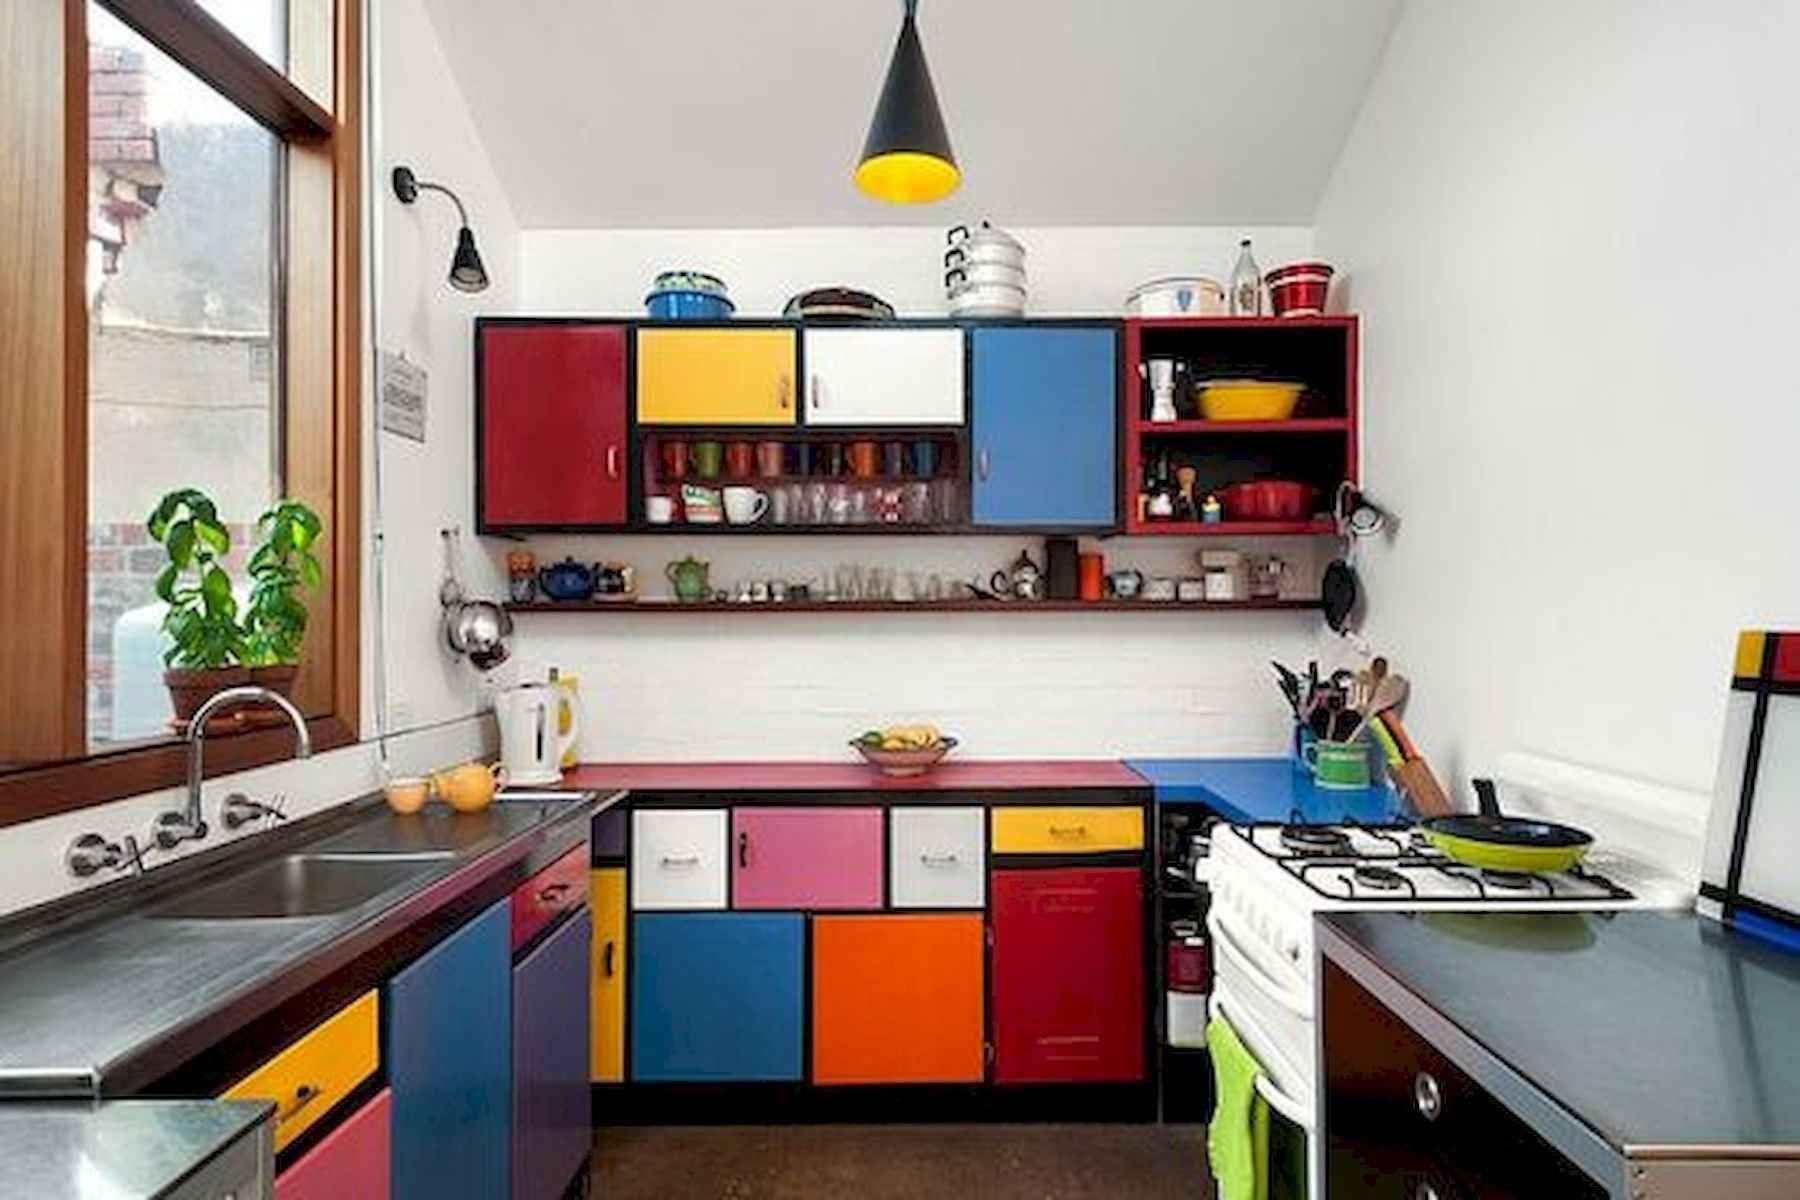 80+ Favorite Colorful Kitchen Decor Ideas And Remodel for Summer Project kitchen #80+ #favorite #colorful #kitchen #decor #ideas #and #remodel #for #summer #project